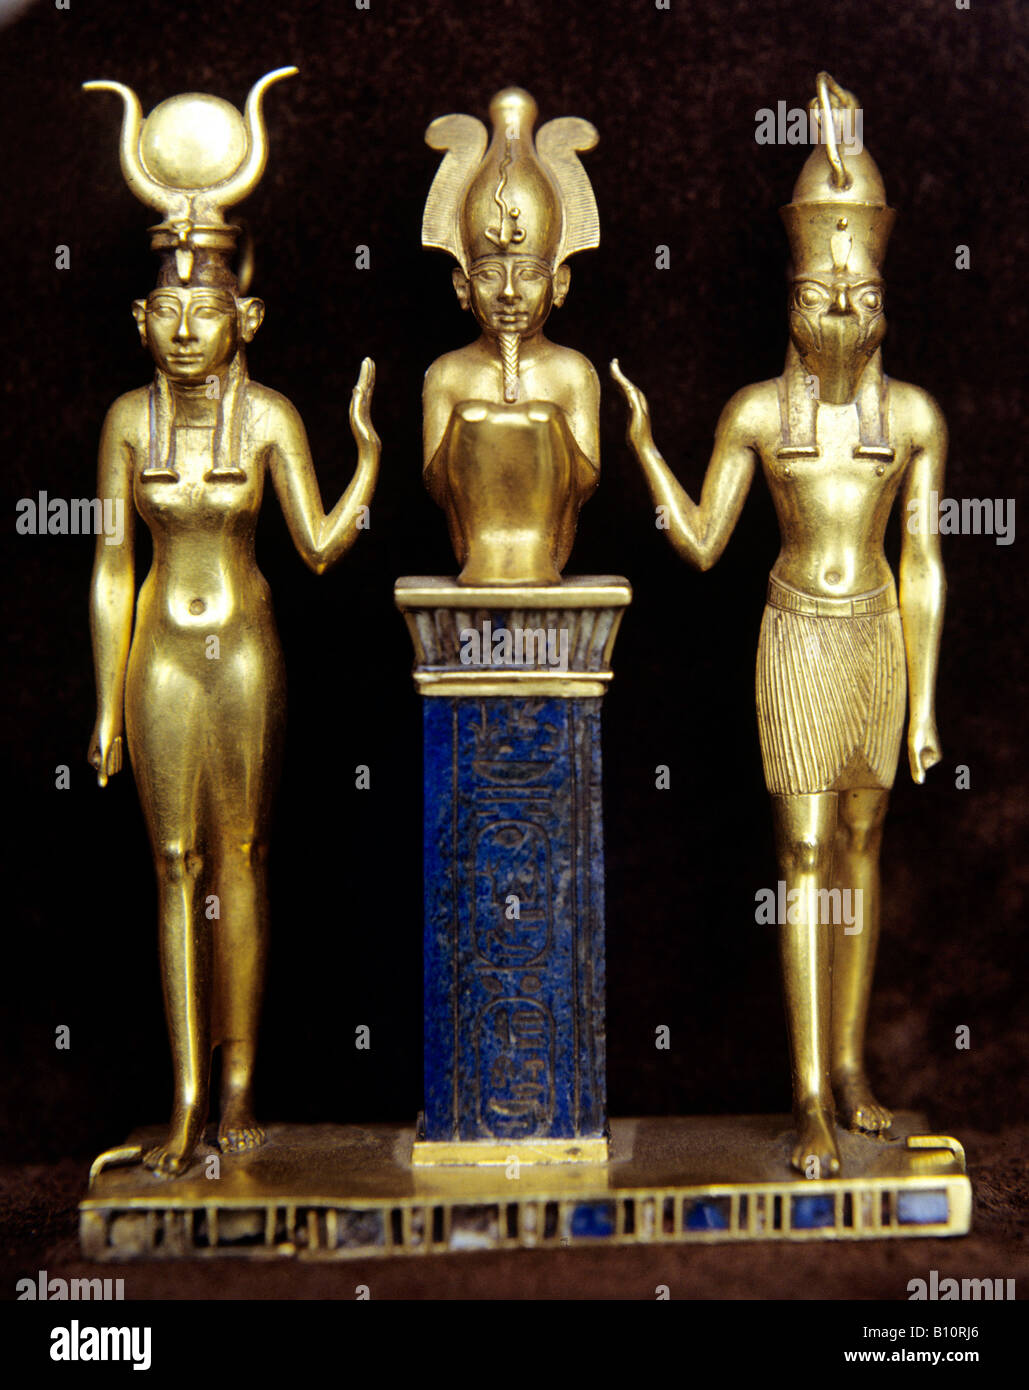 Horus Osiris Isis jewel of King Osorkon 950 BC Ancient Egypt. - Stock Image